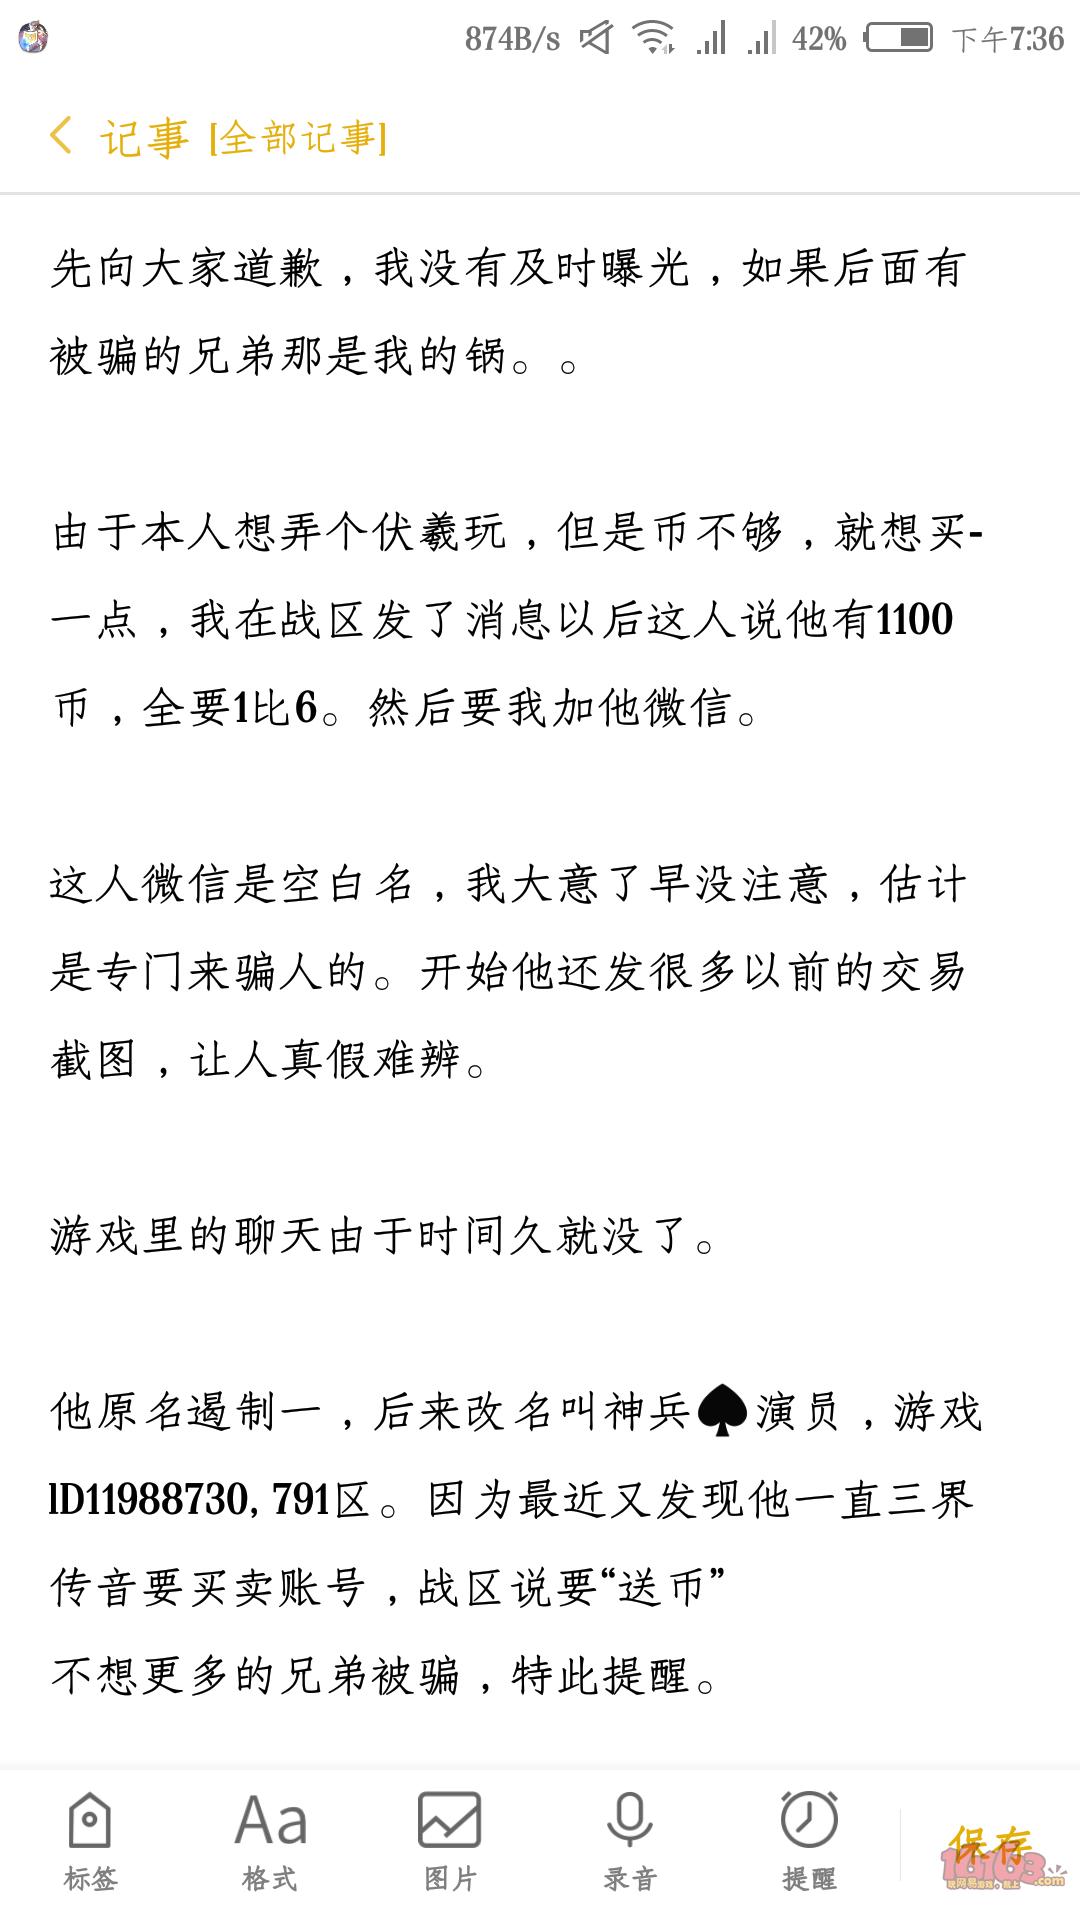 Screenshot_2018-10-08-19-36-58.png